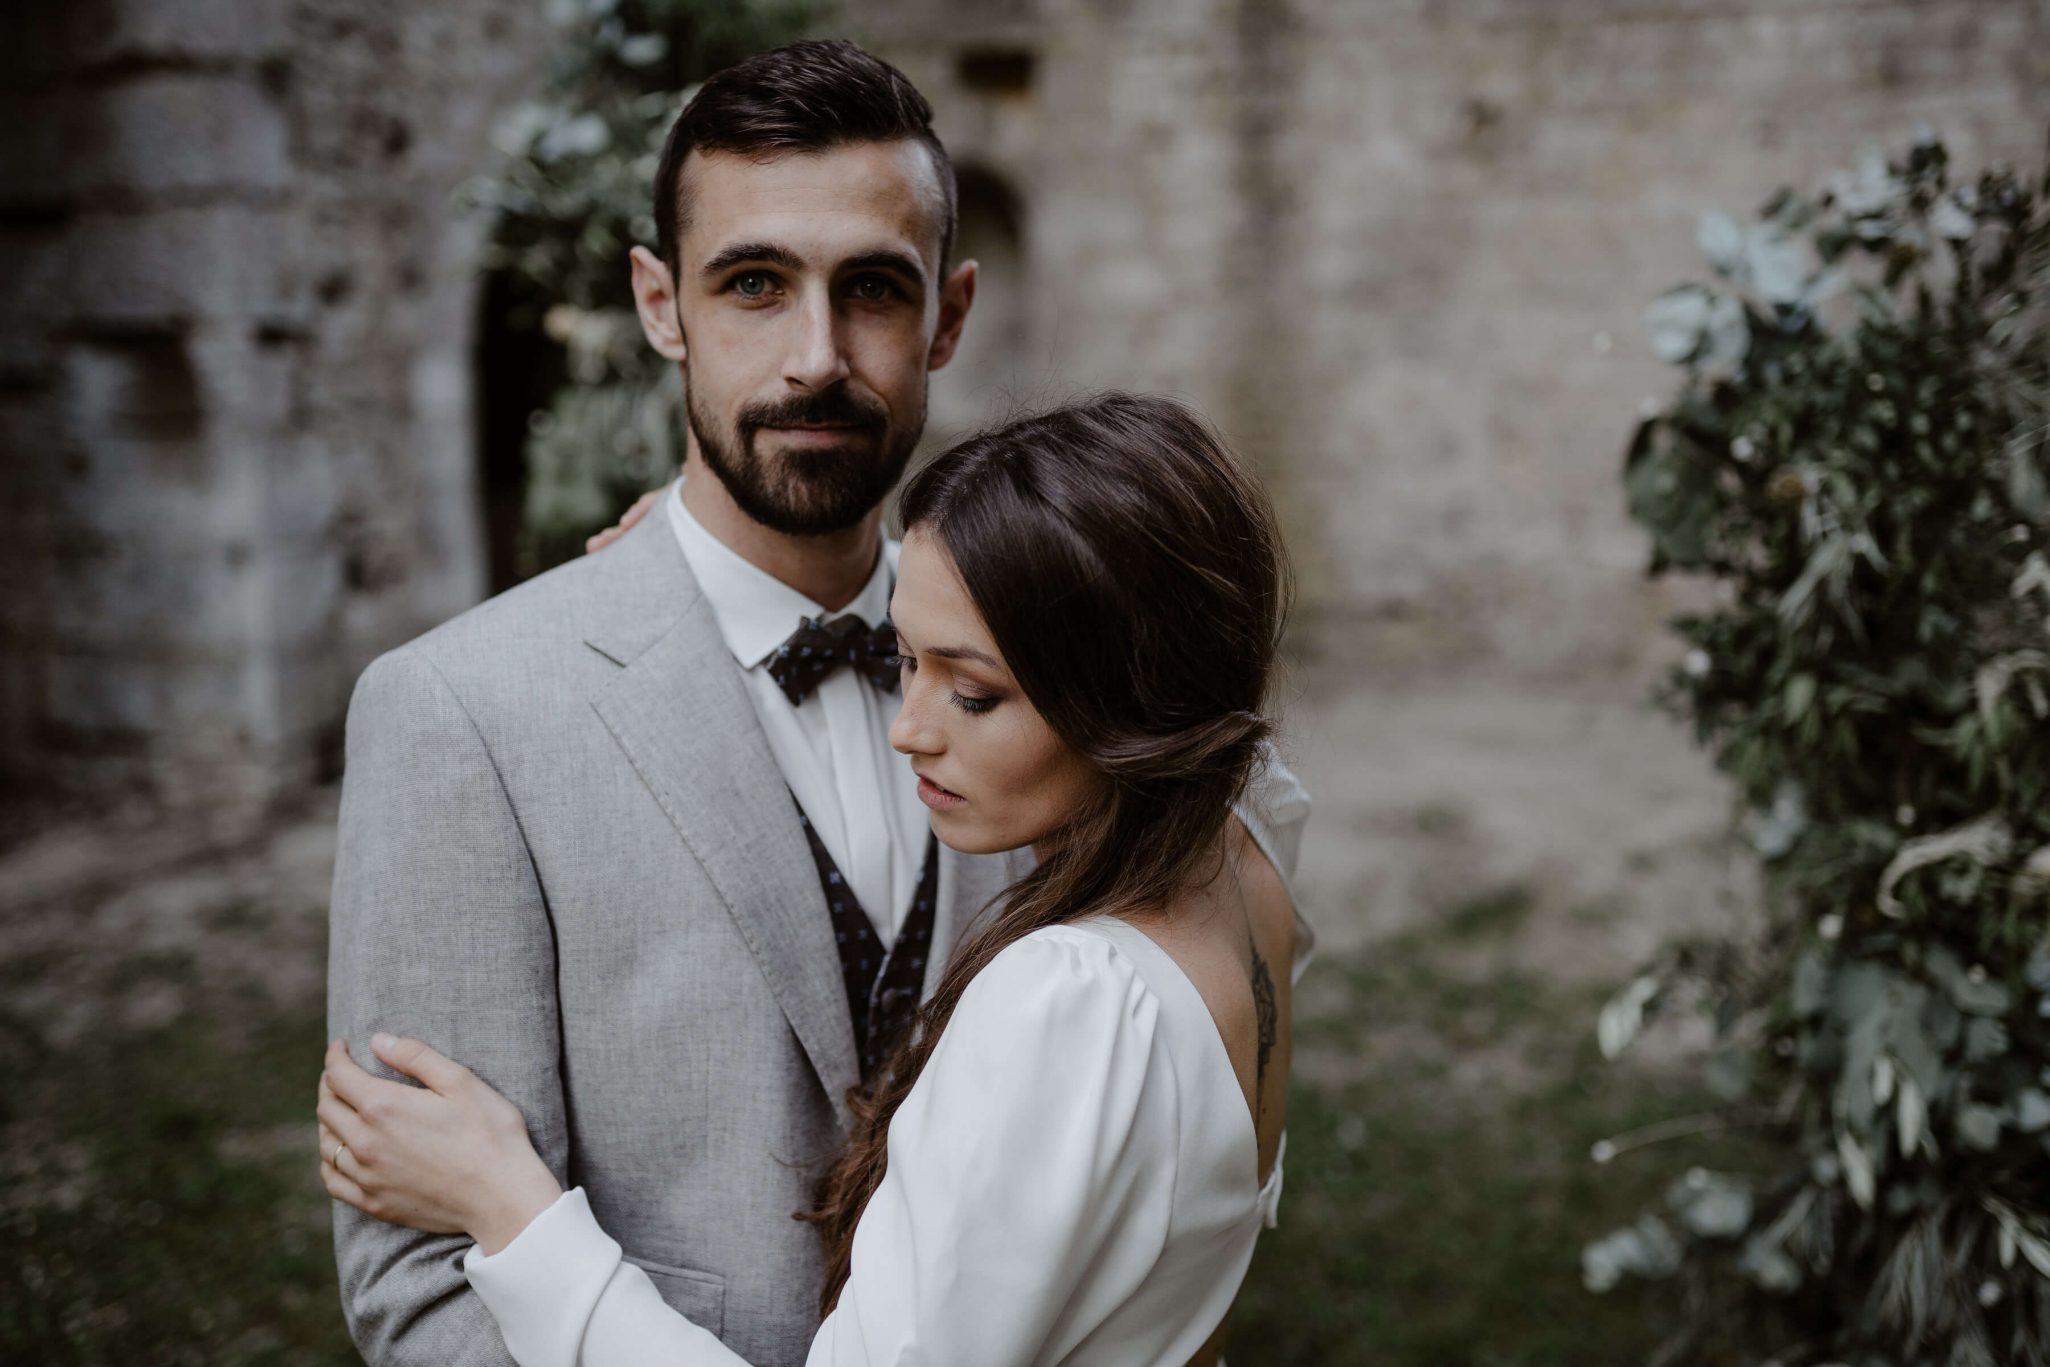 mariage_boheme_simple_vegetal_nature